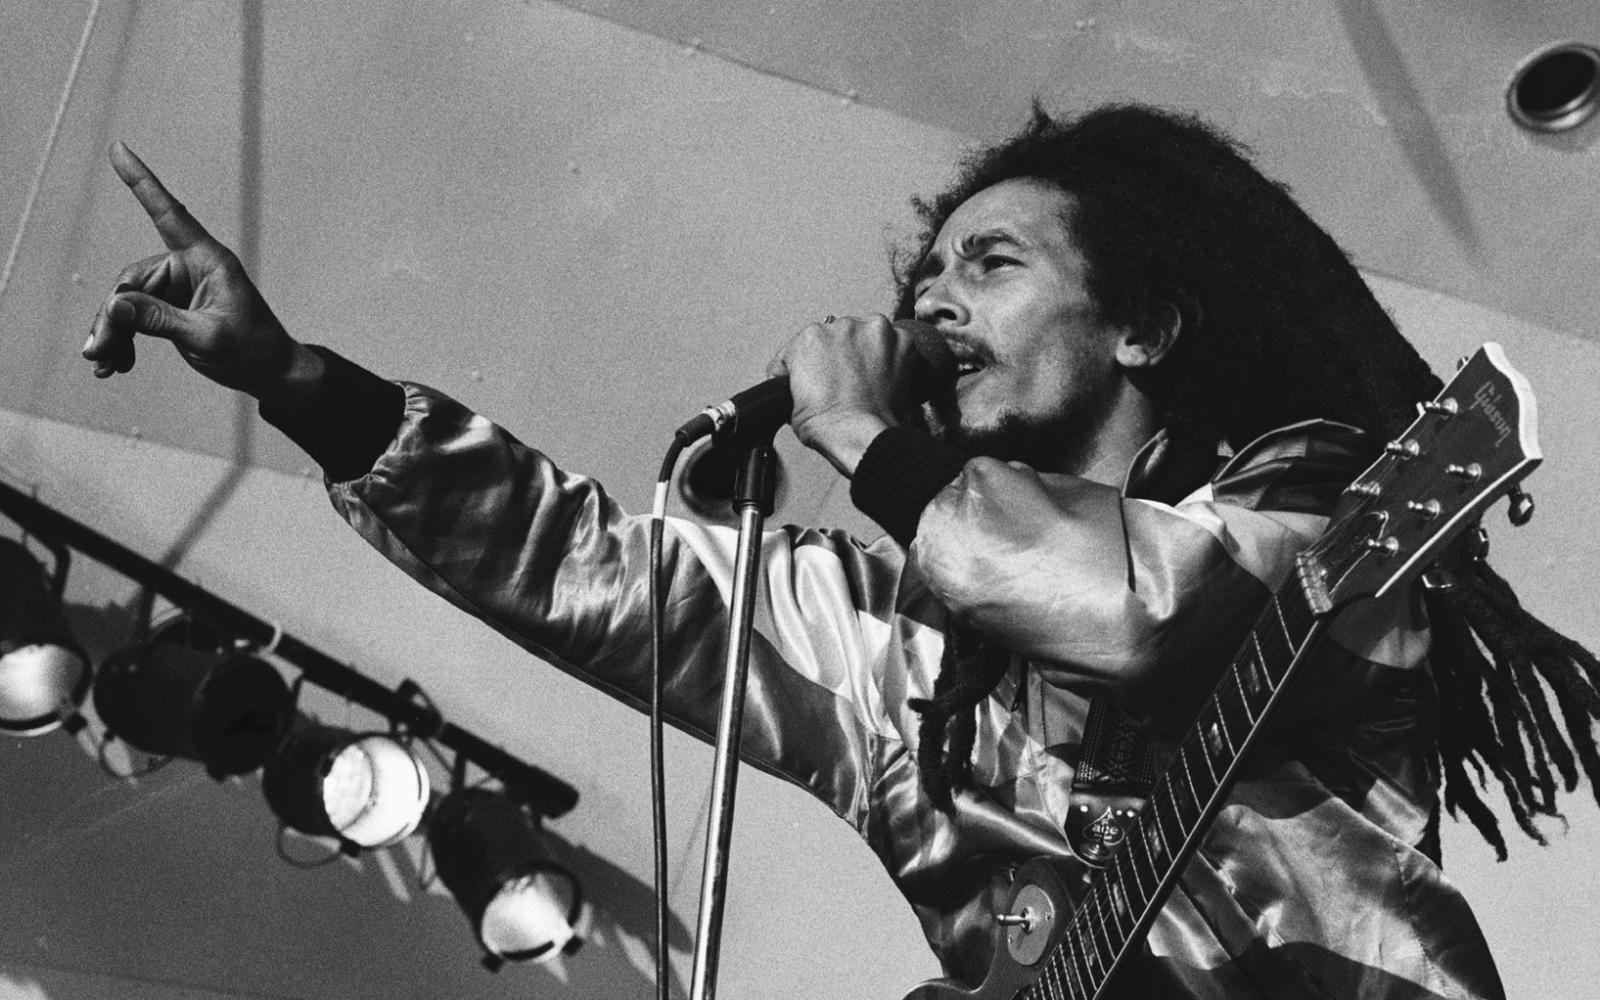 Bob Marley en plein concert, micro en main et dreadlocks dans les airs